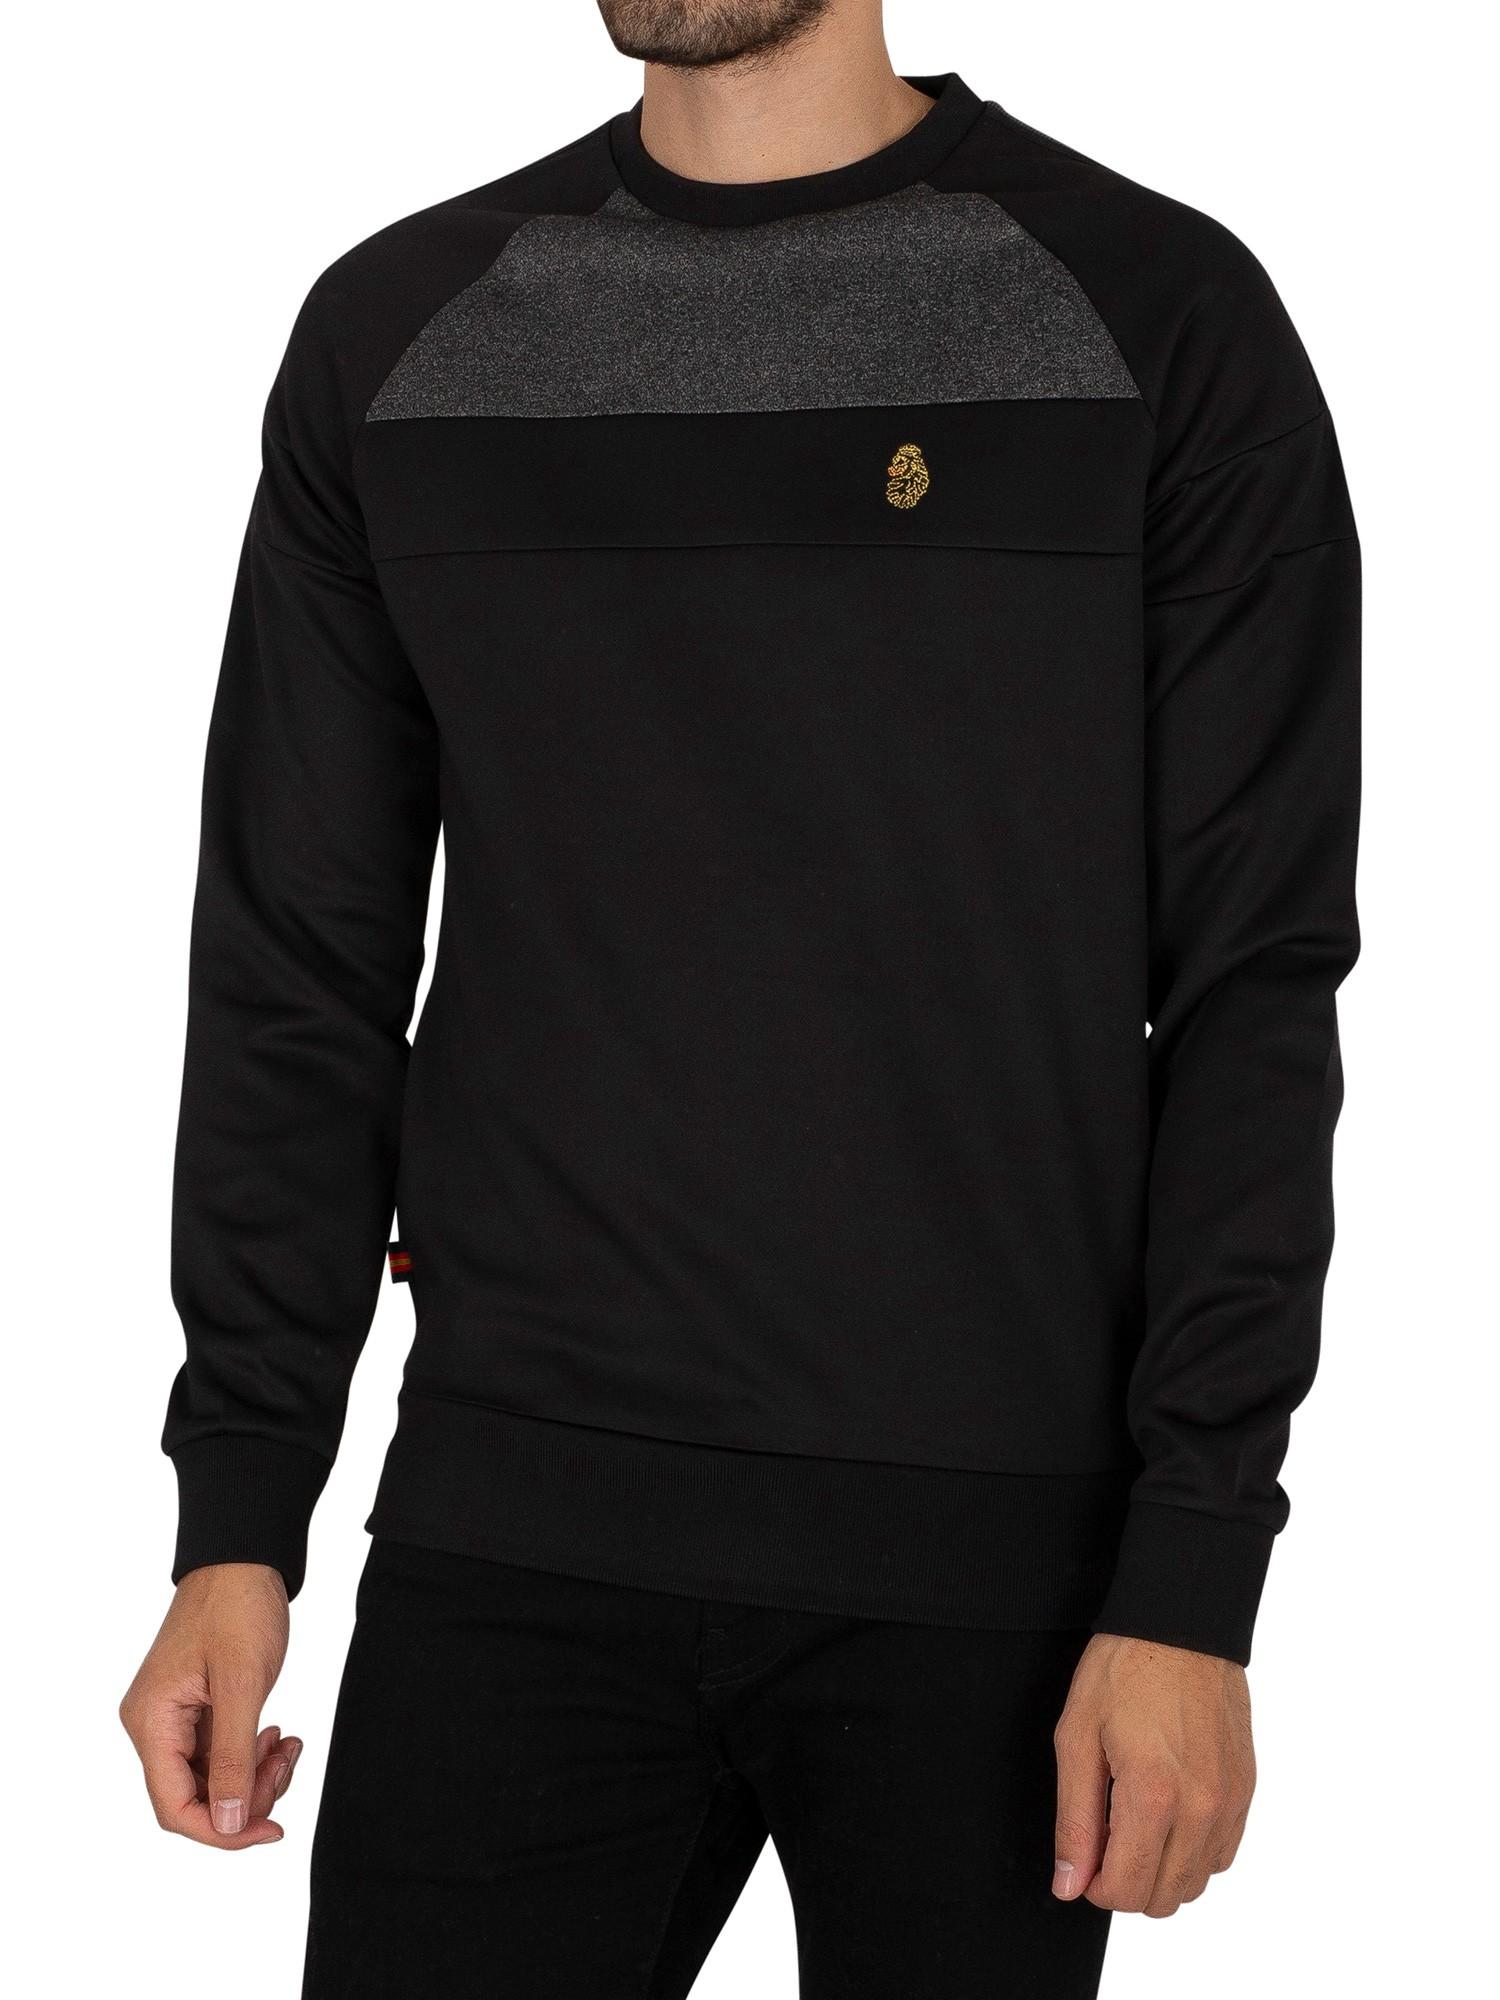 Adam 3 Sport Tape Sweatshirt